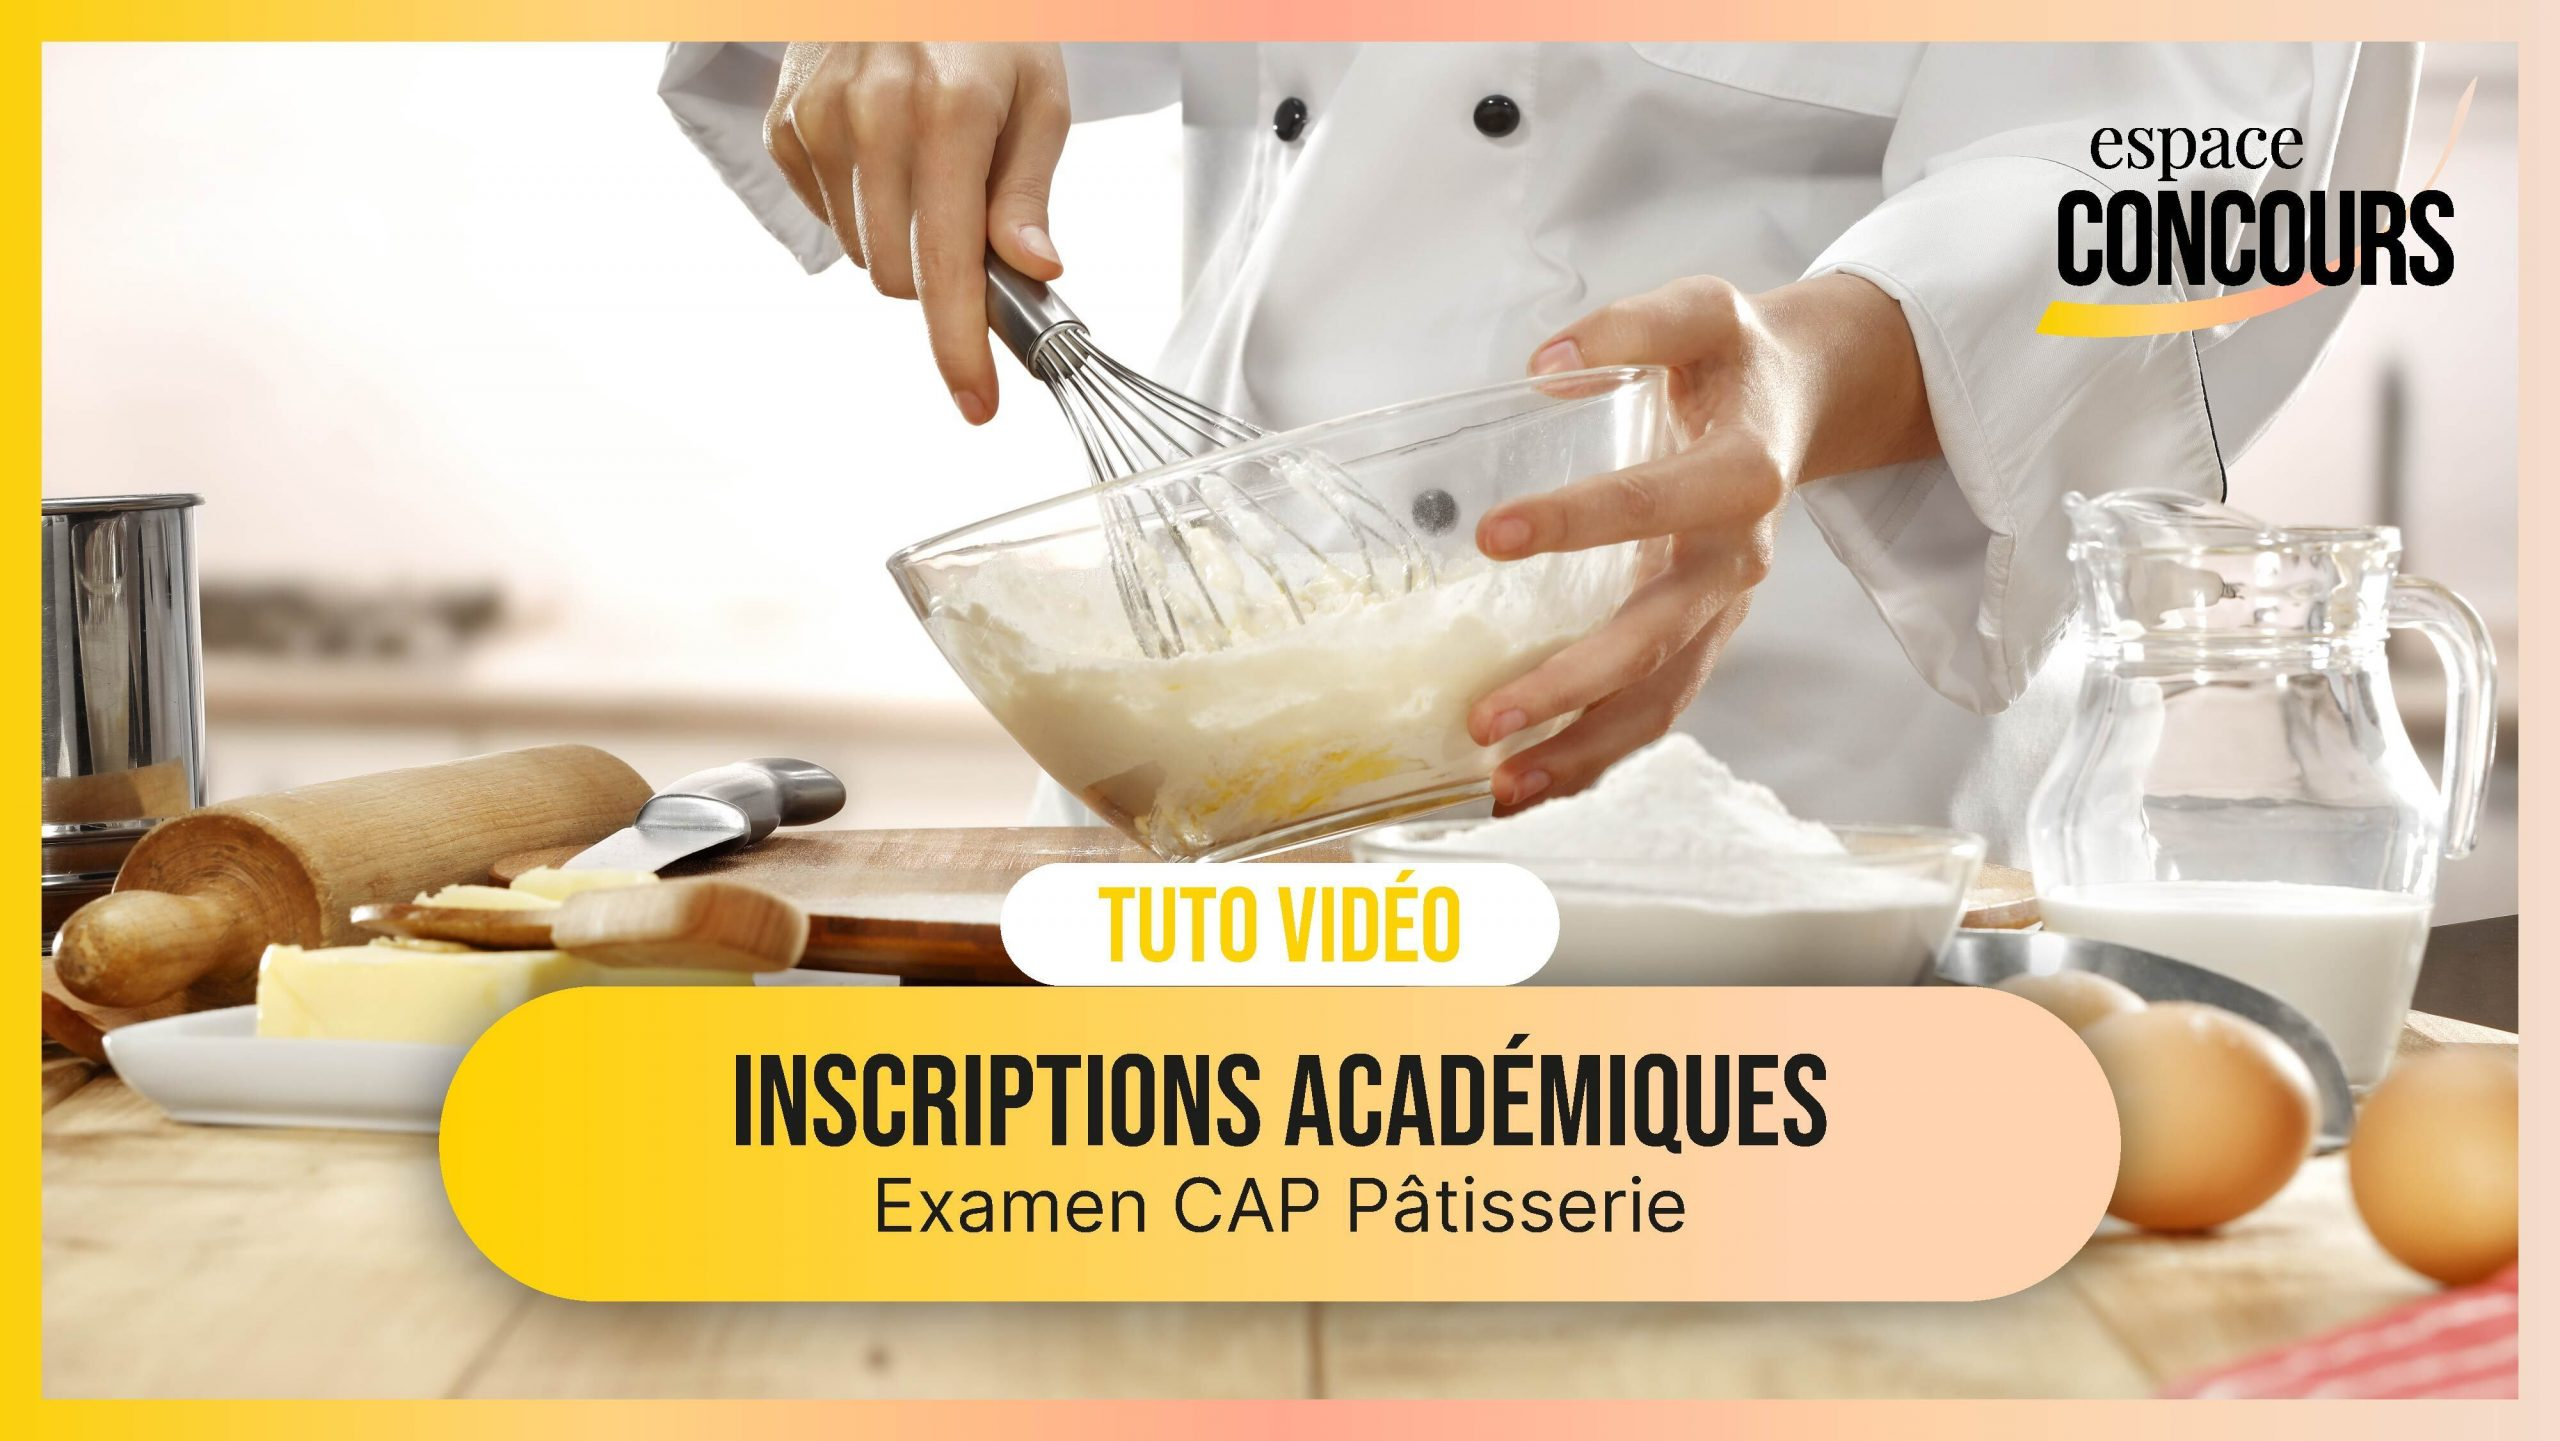 Vidéo Tuto – Les inscriptions Académiques Examen CAP Pâtisserie